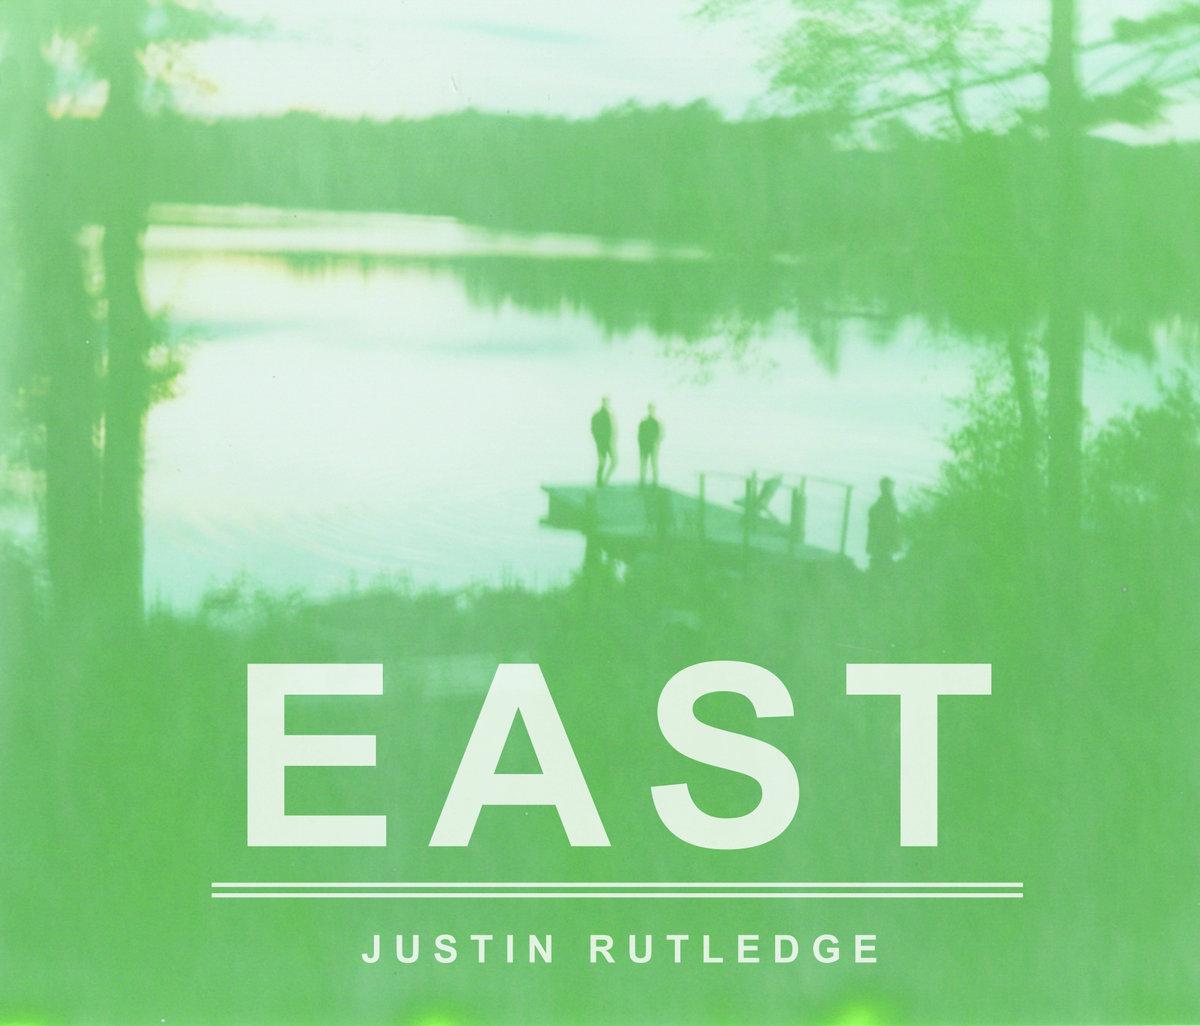 justinrutledge_east.jpg